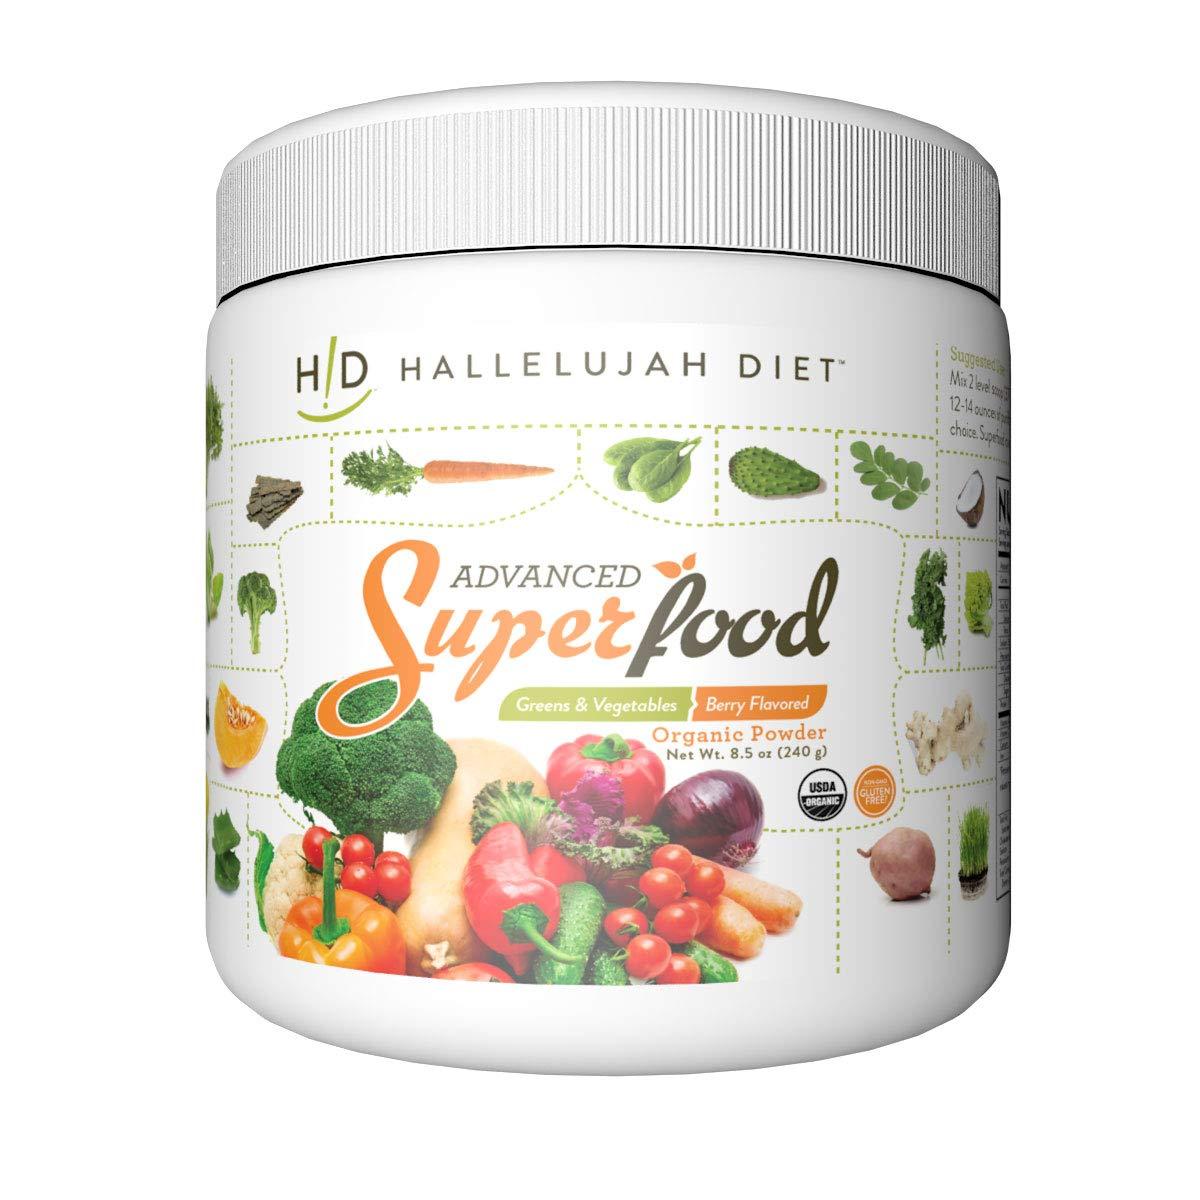 Advanced SuperFood, Greens and Vegetable Organic Powder - Berry, 8.5 oz. (240g), by Hallelujah Diet by Hallelujah Diet